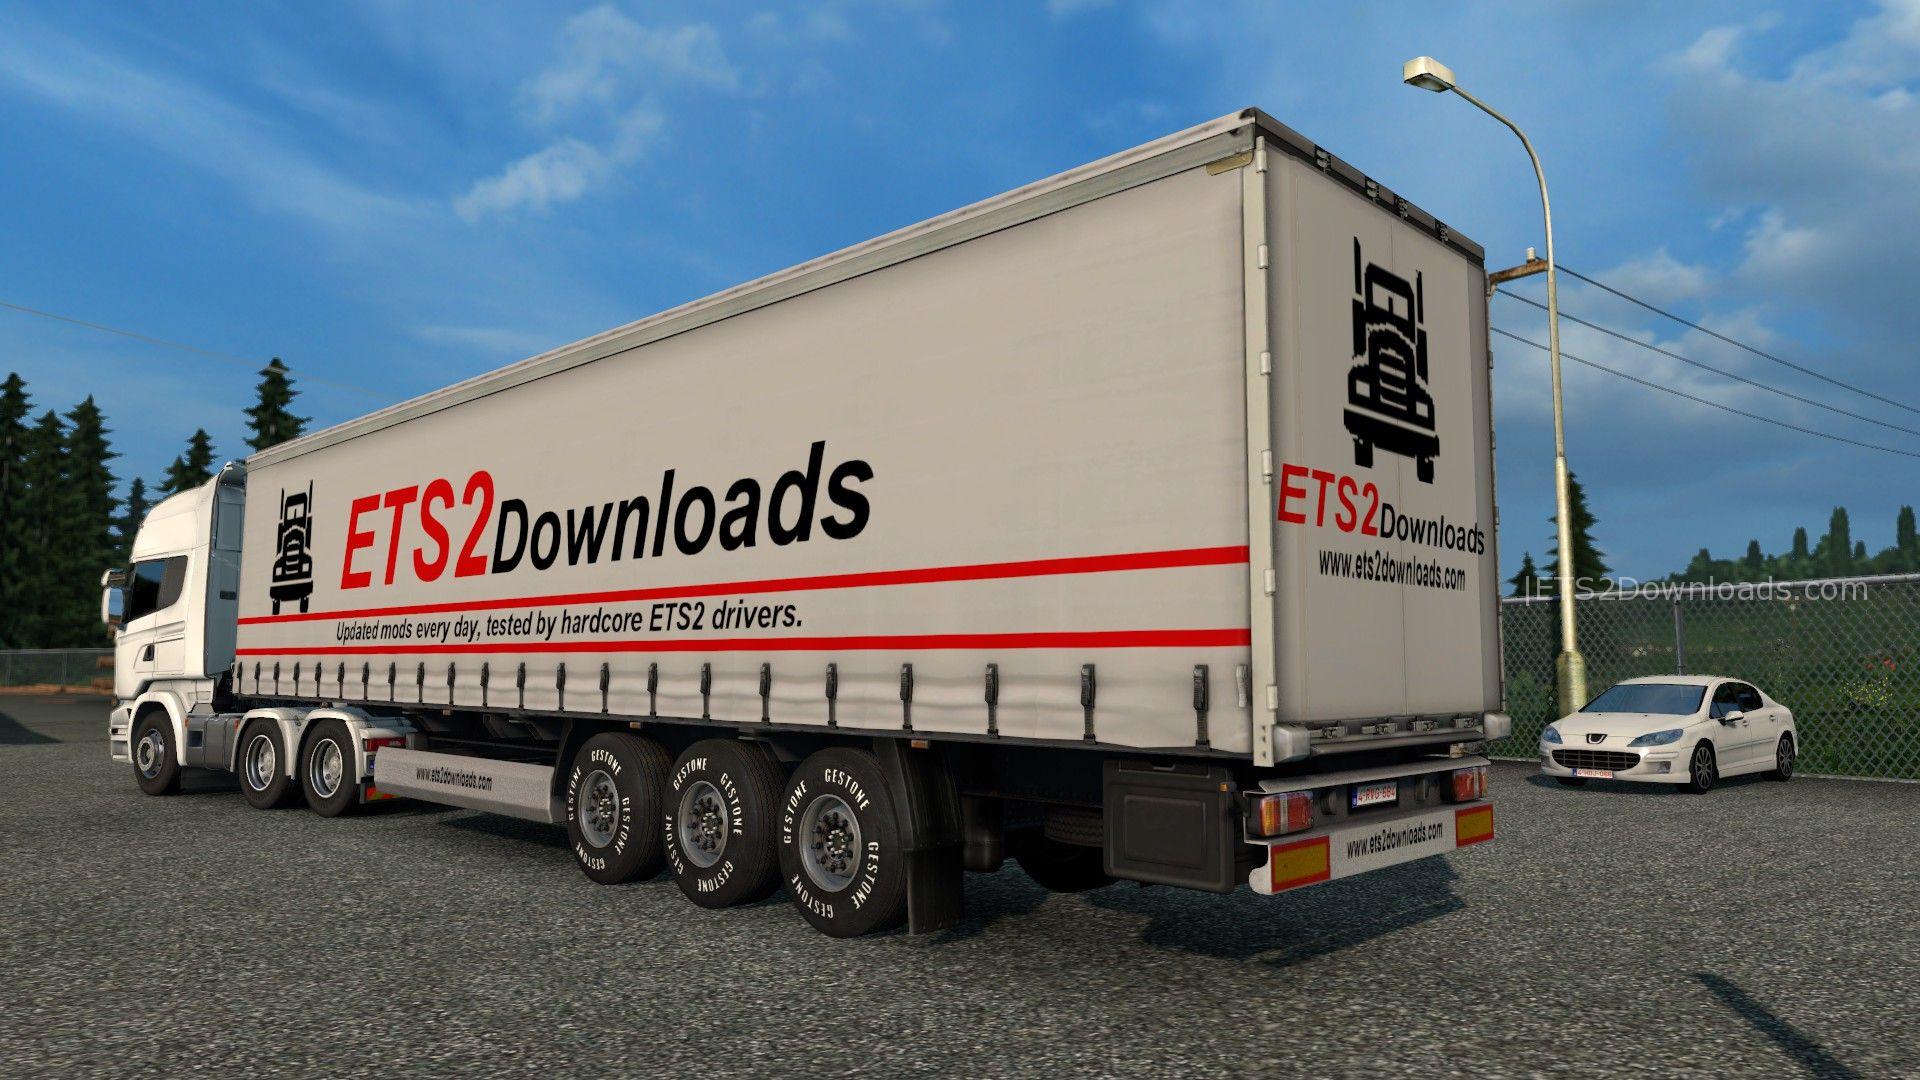 ets2downloads-trailer-2